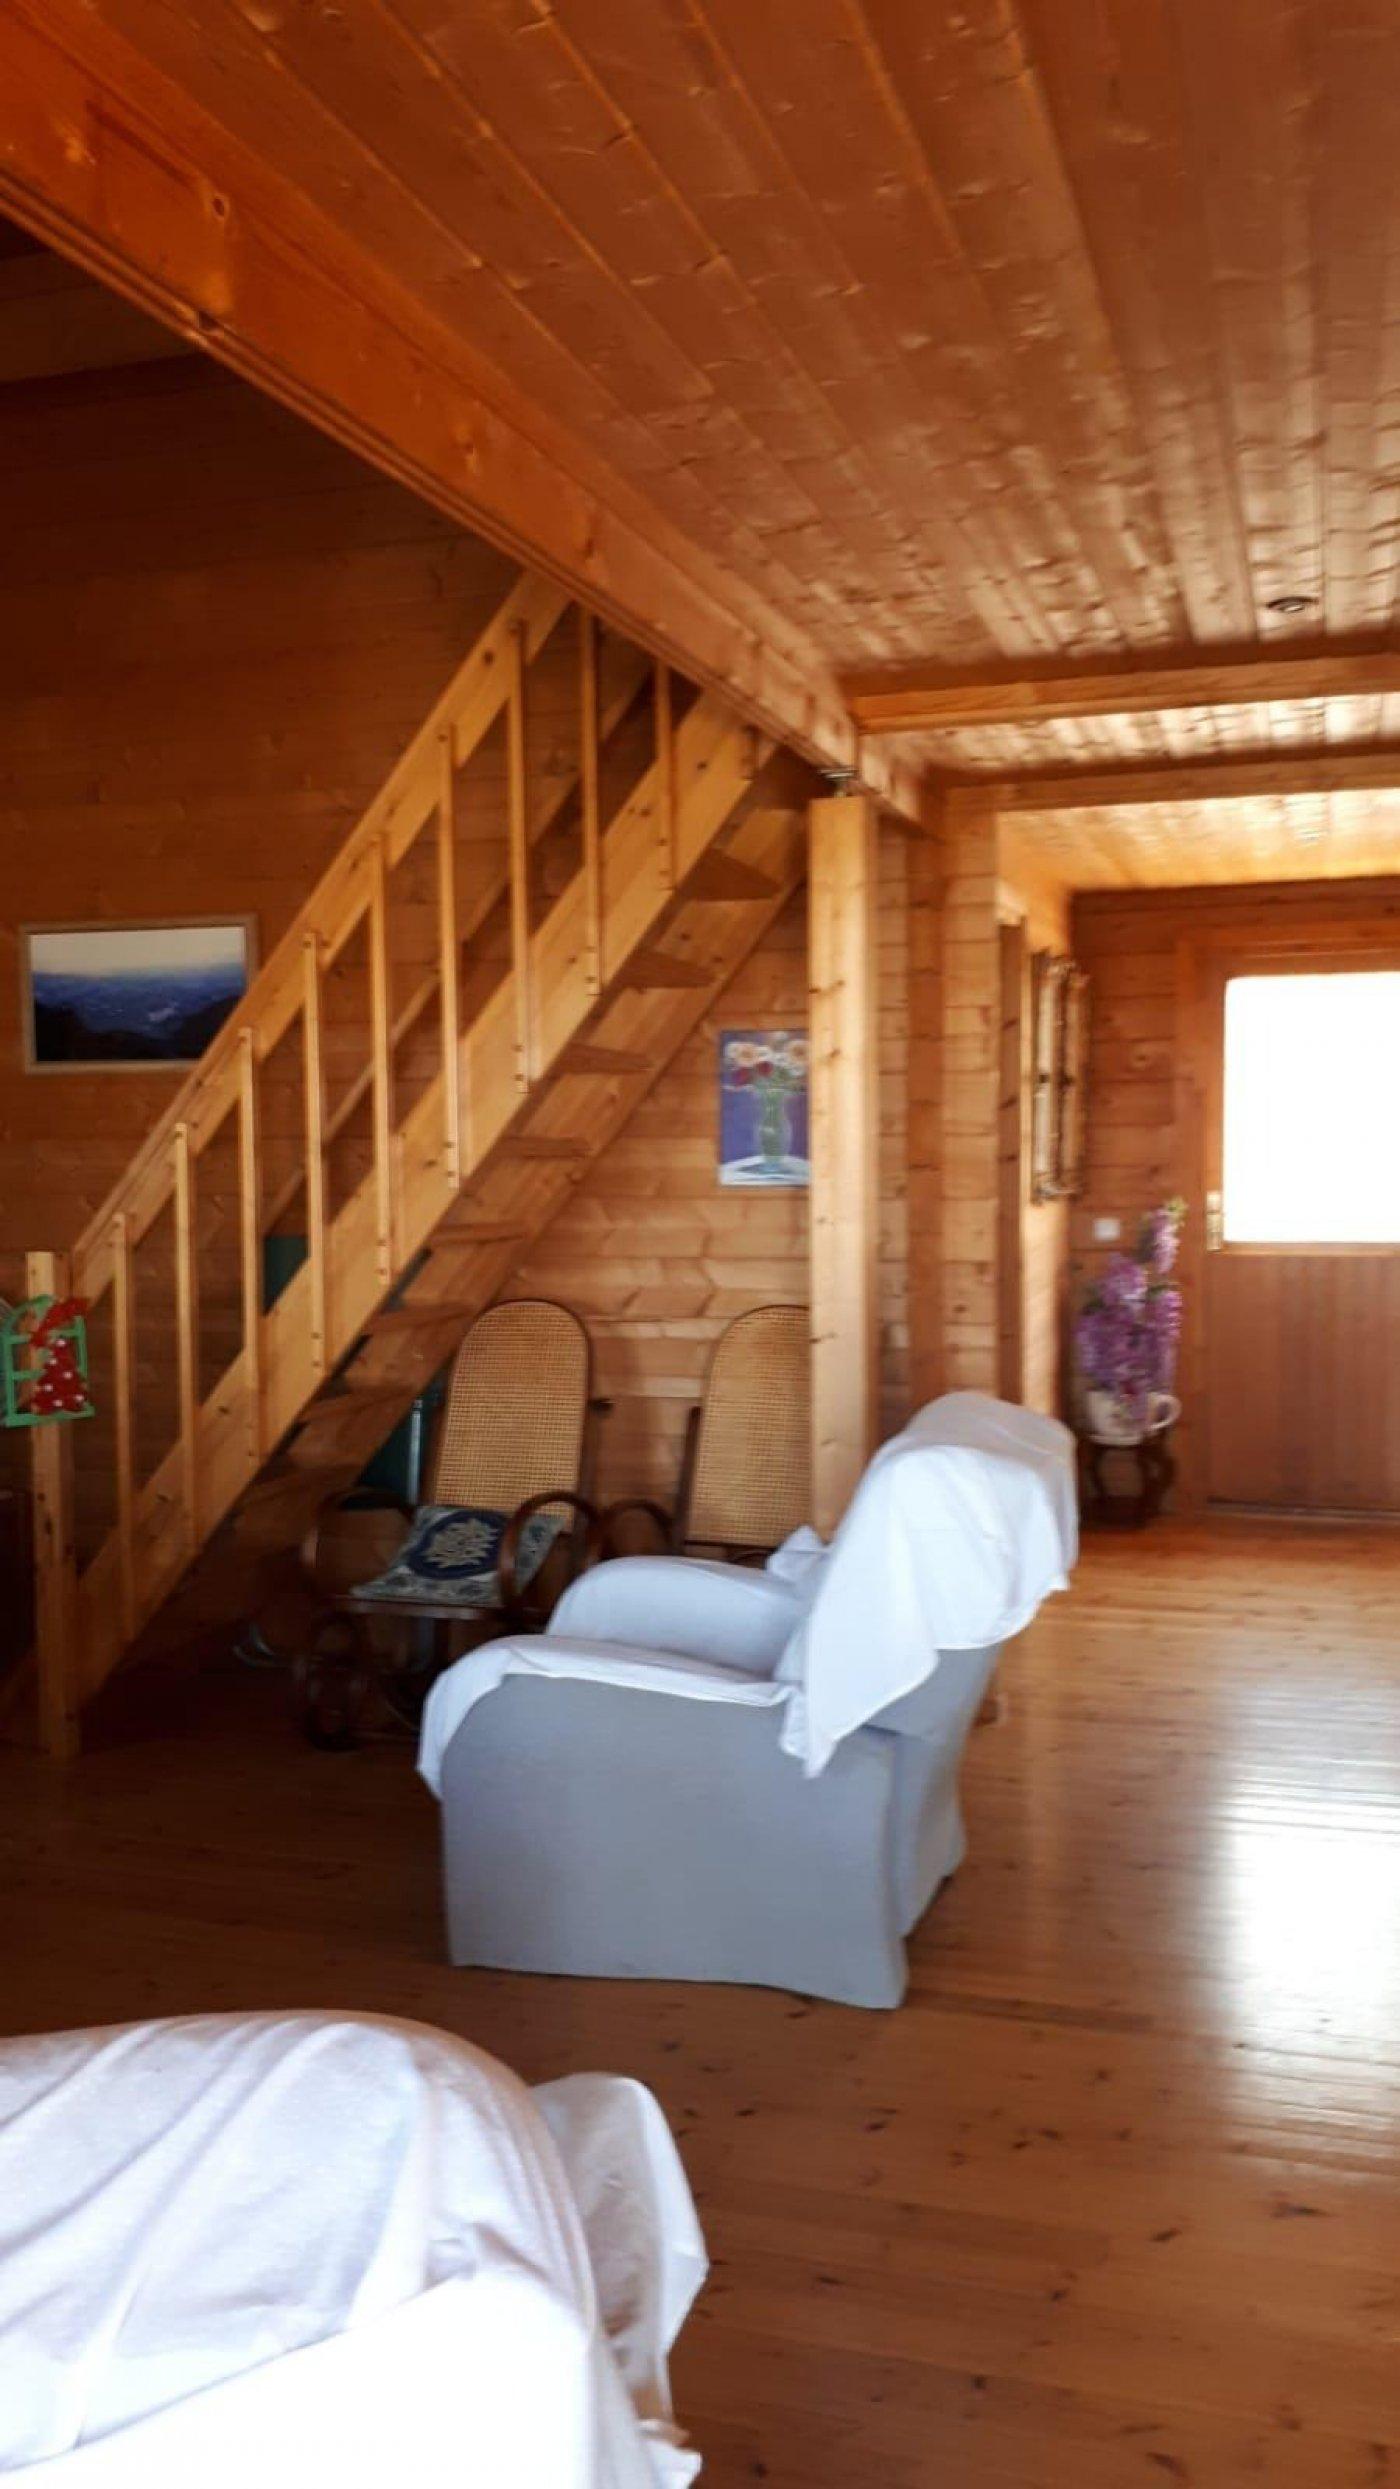 Casa en beniatjar - imagenInmueble2